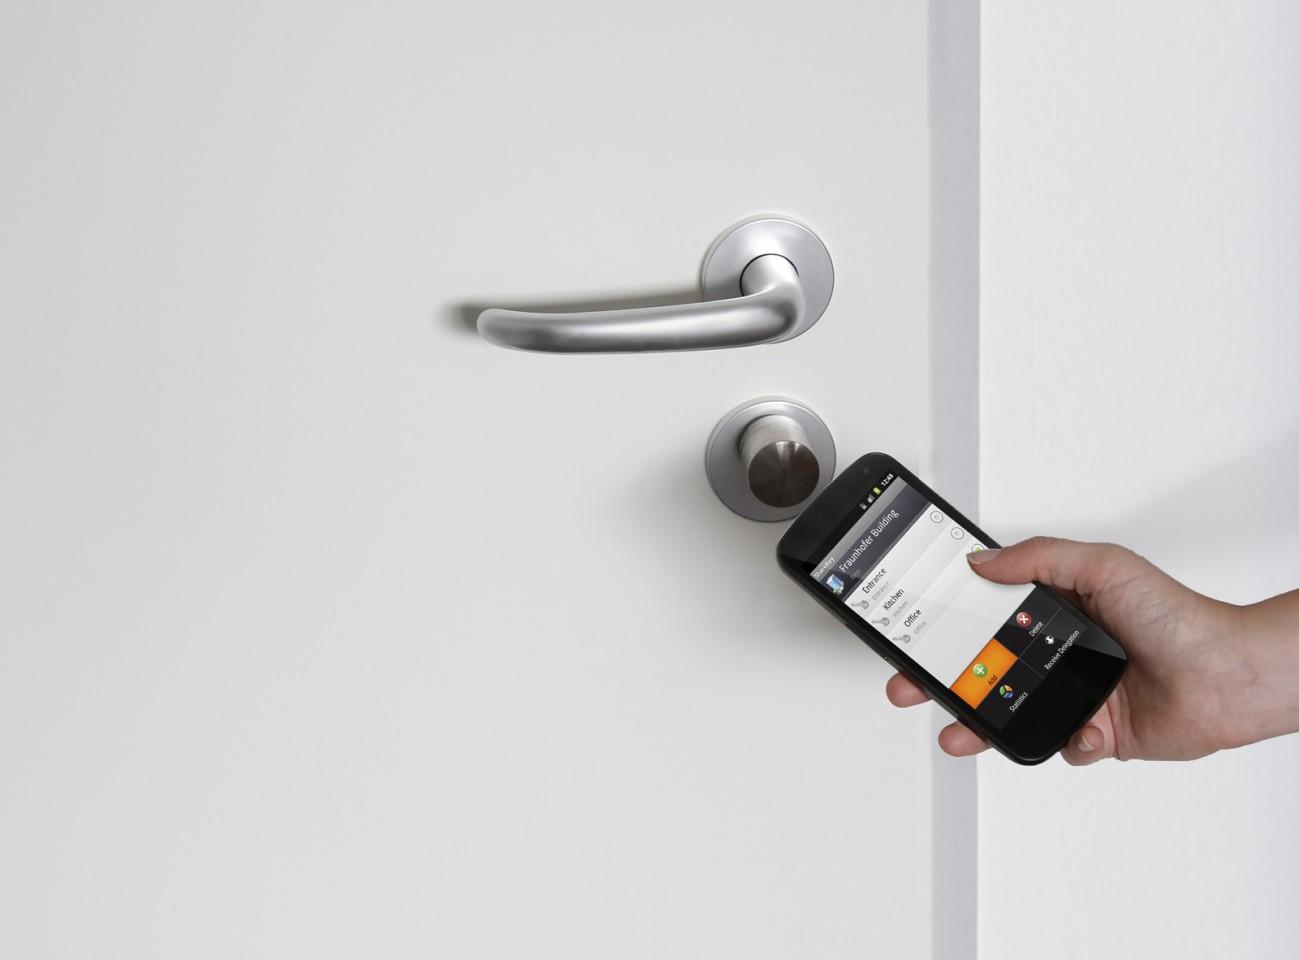 ShareKey smartphone app replaces your house keys